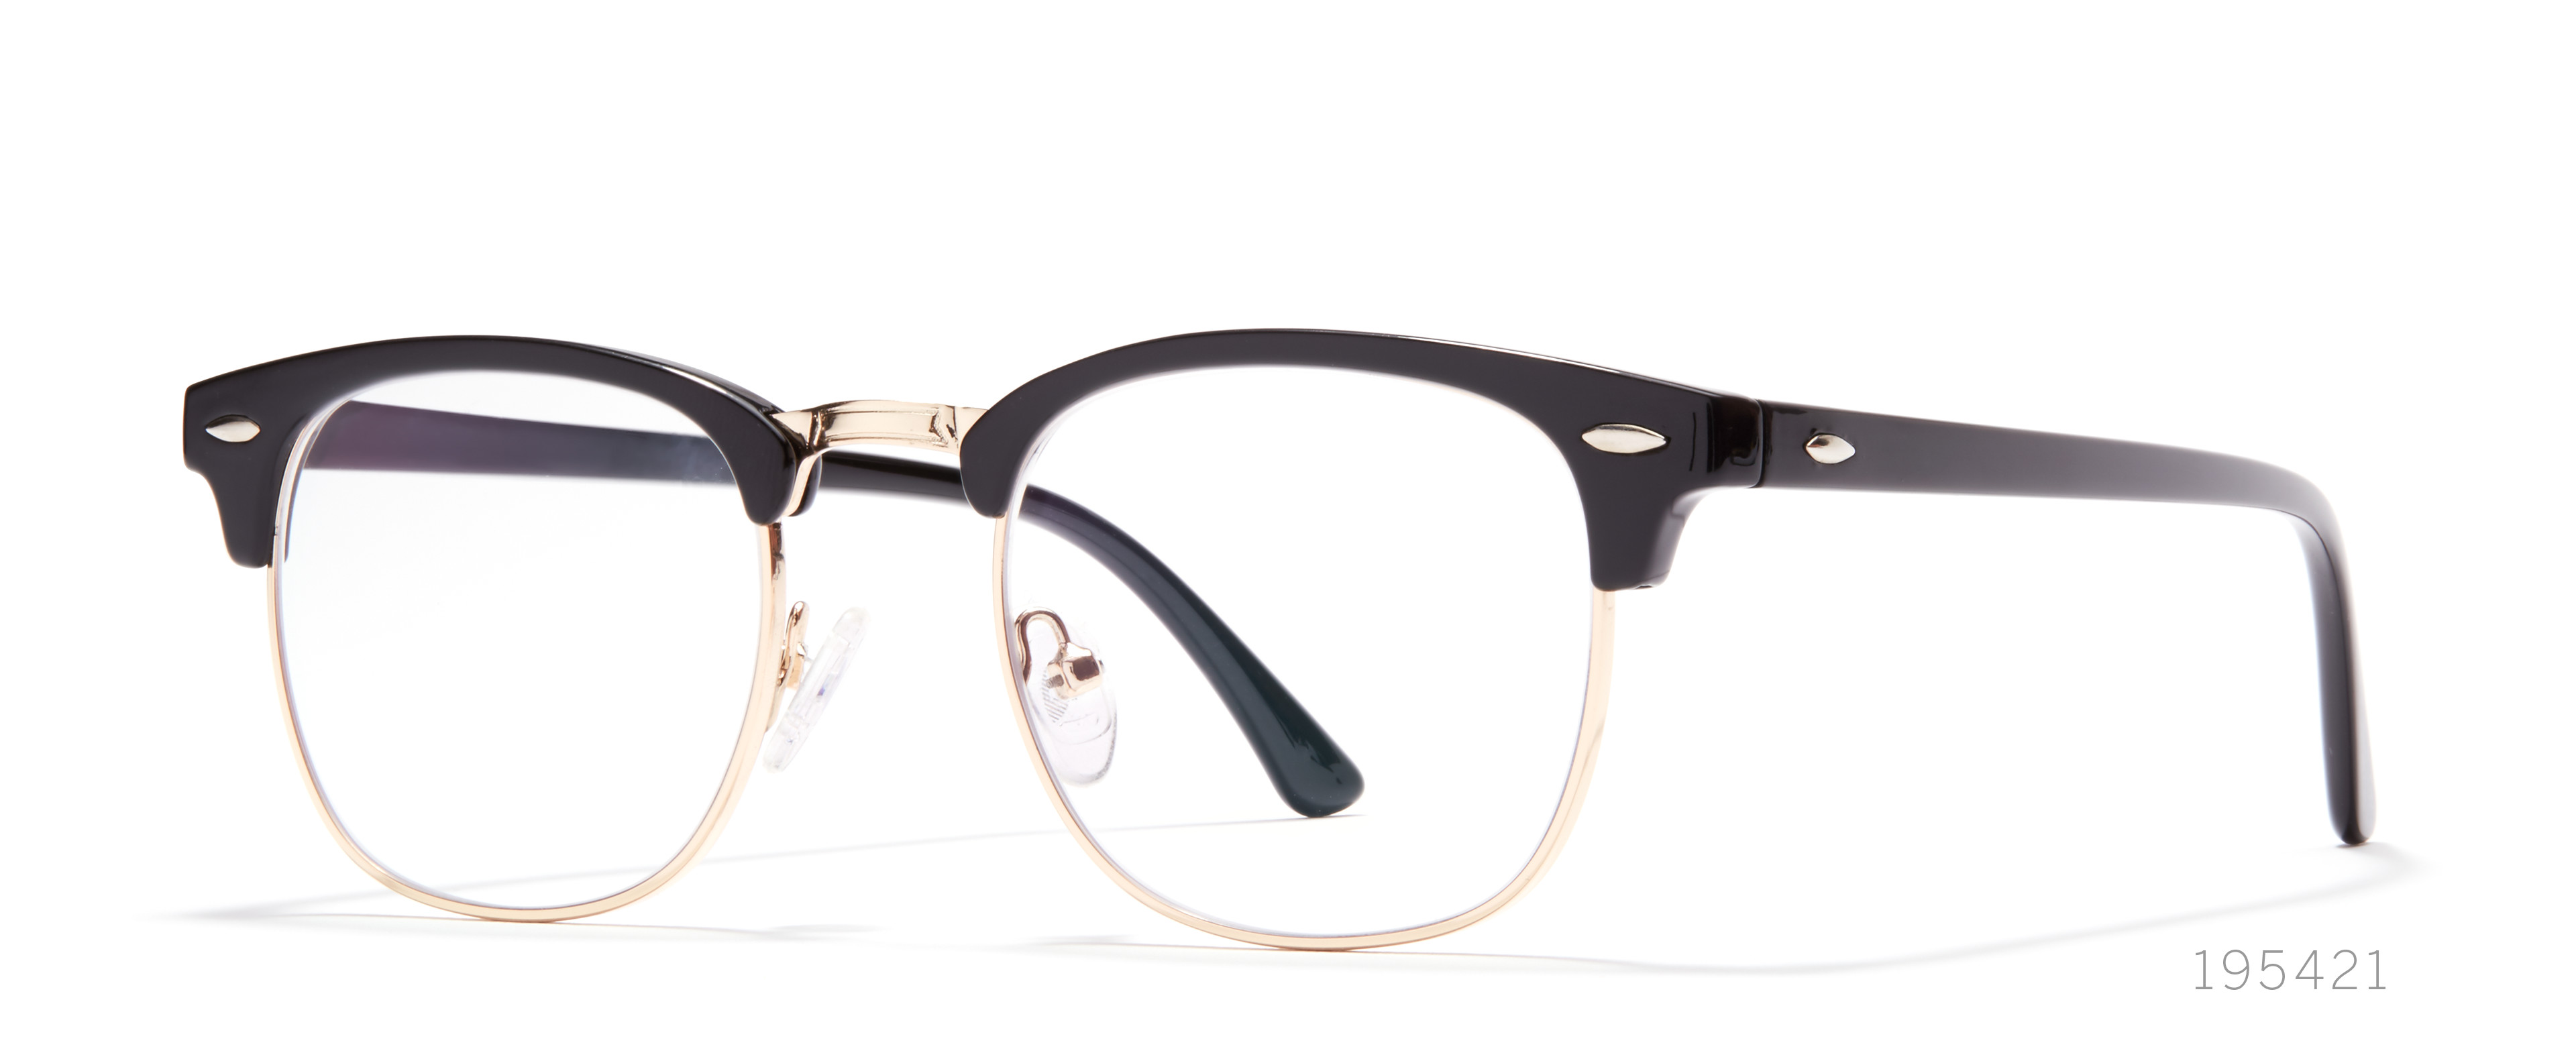 browline black eyeglasses